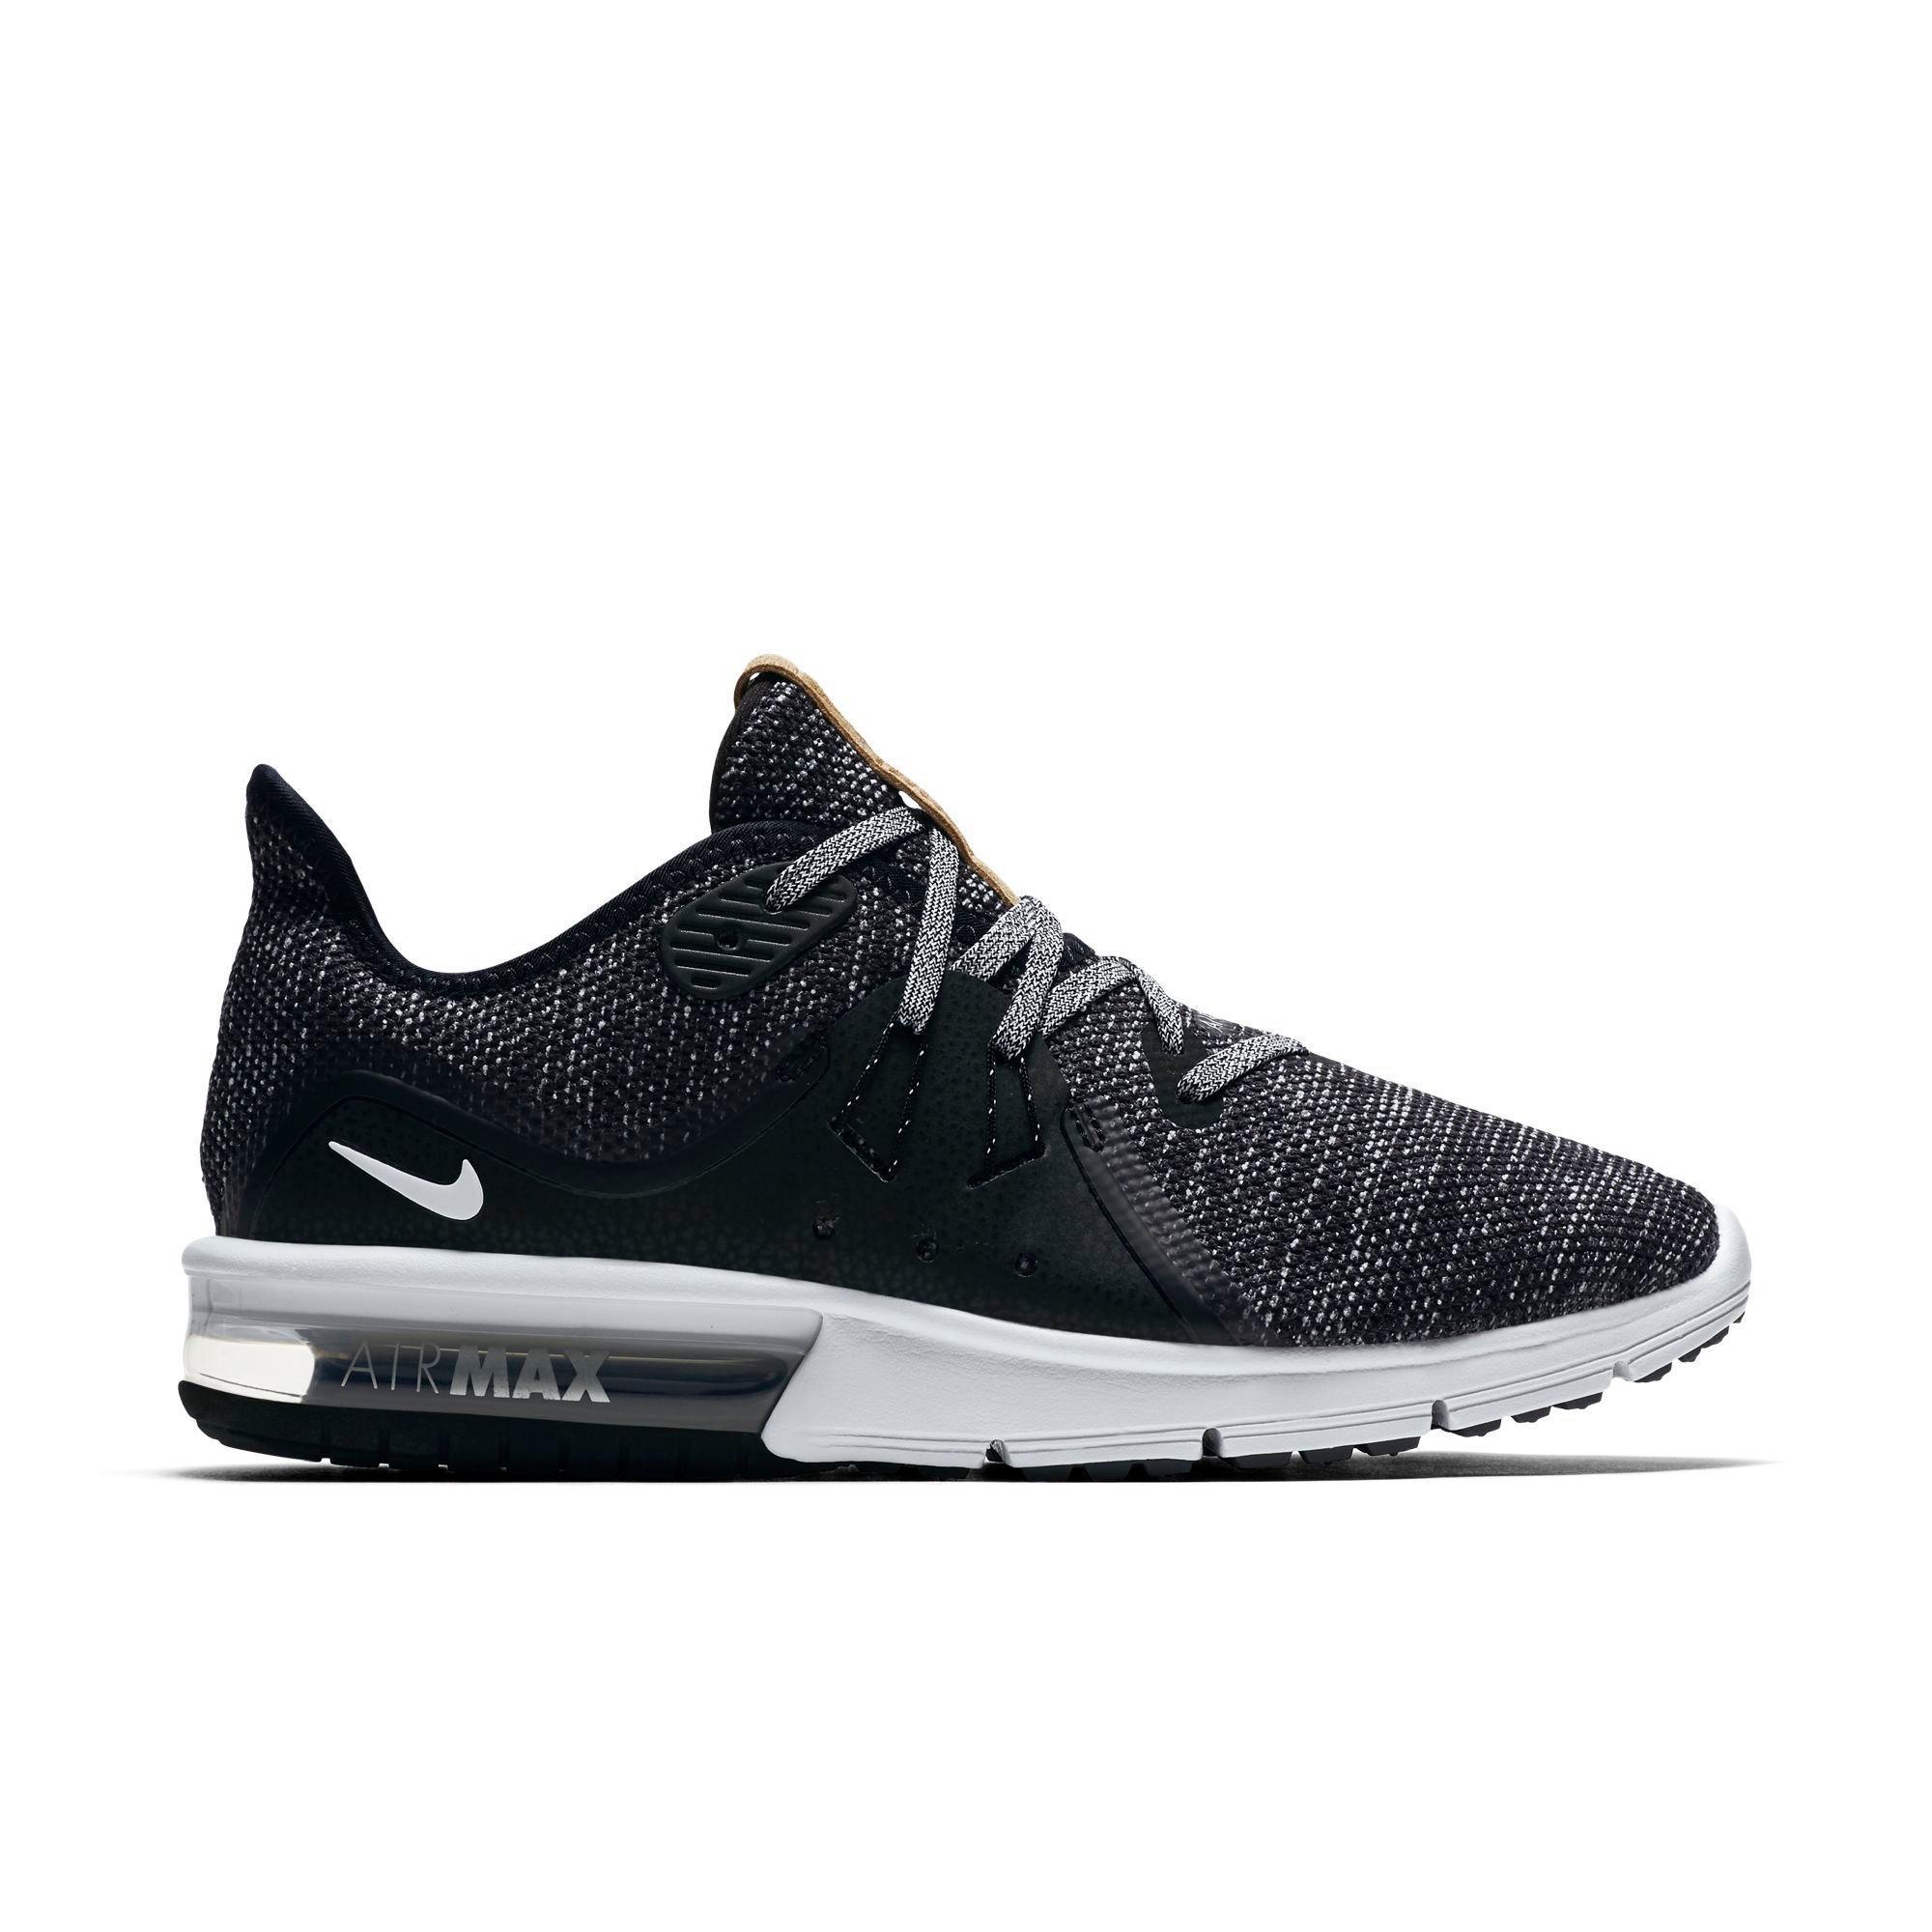 29ff8c64e20 Black Nike Air Primo Boots